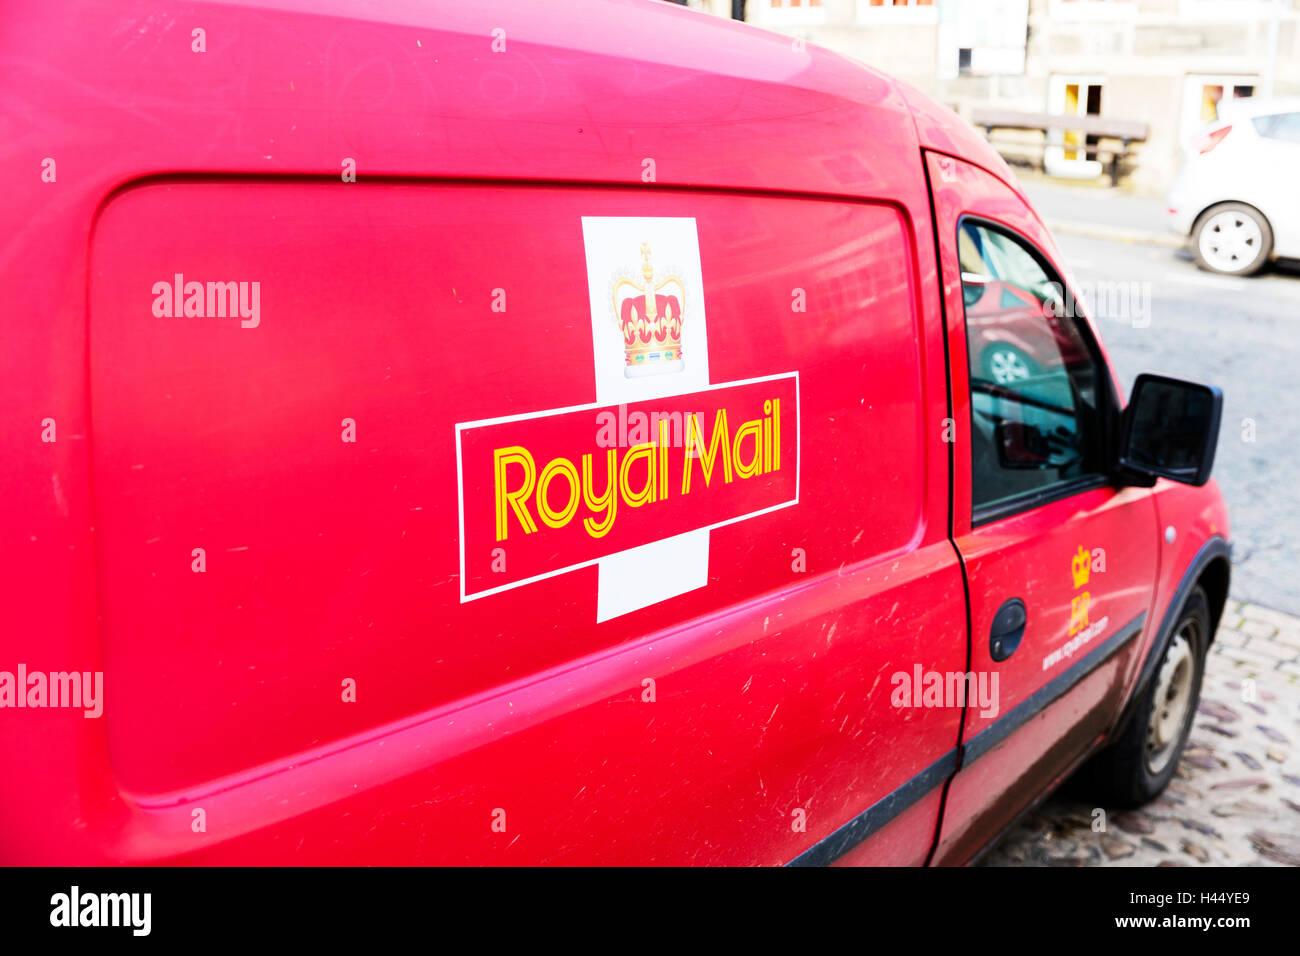 Royal mail van name insignia emblem motif vehicle delivery vans vehicles UK England GB - Stock Image